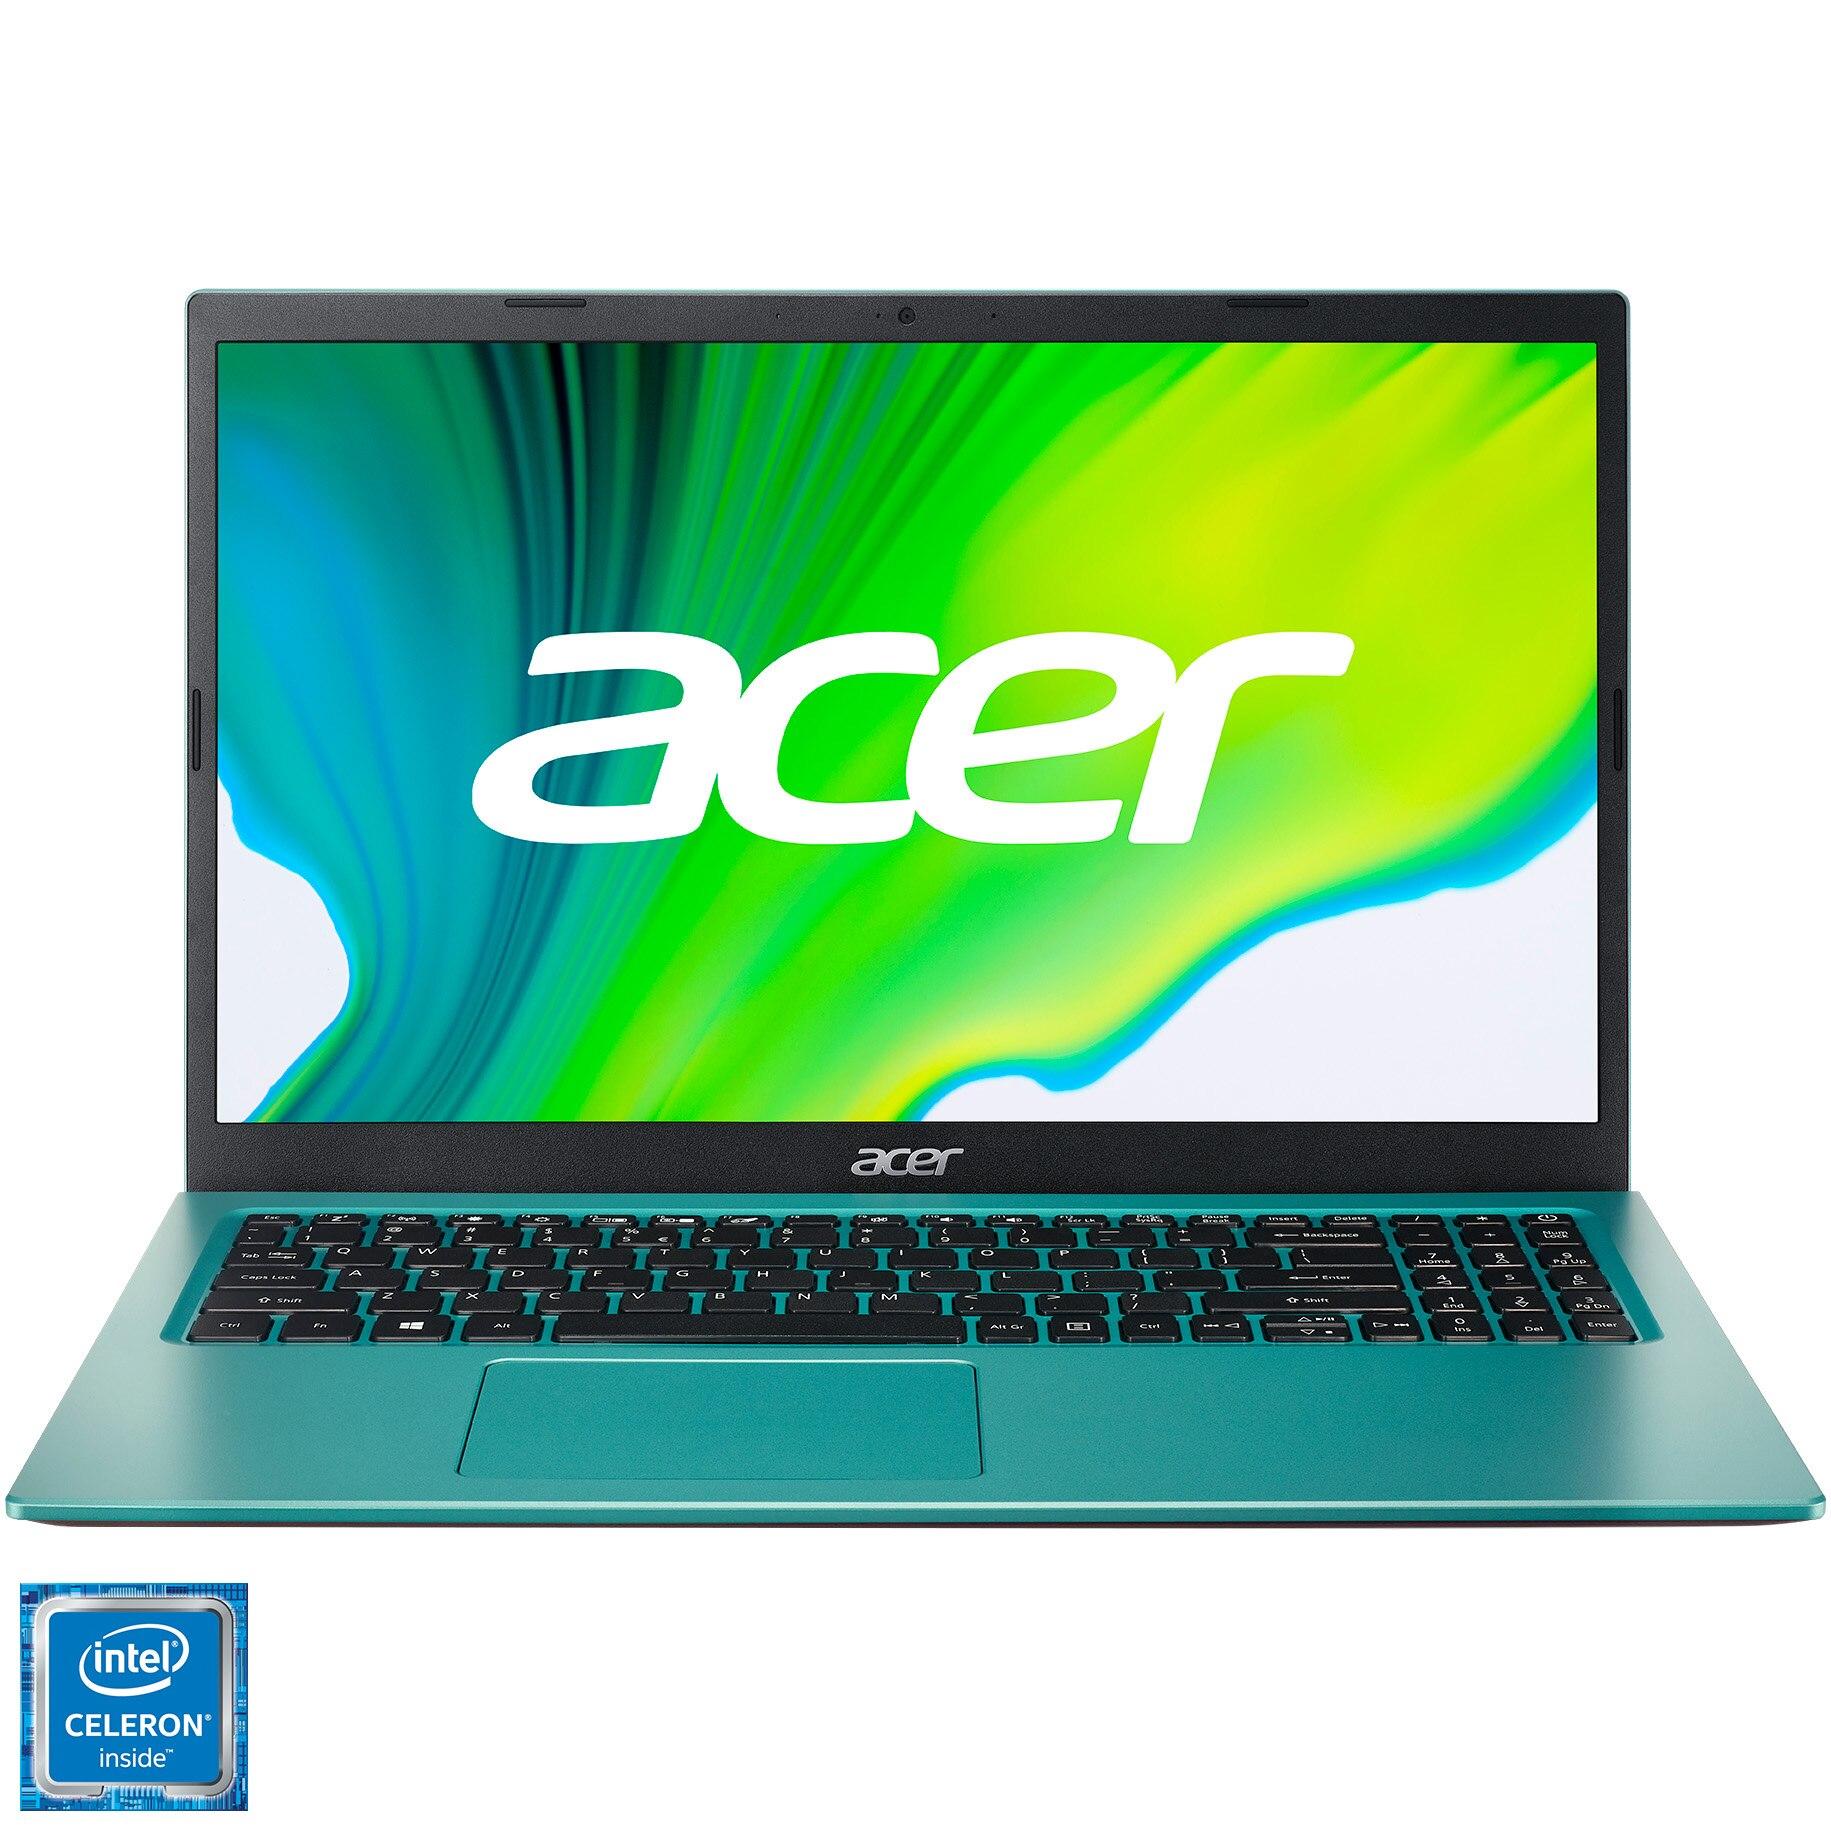 "Fotografie Laptop Acer Aspire 3 A315-35 cu procesor Intel® Celeron® N4500 pana la 2.80 GHz, 15.6"", Full HD, 8GB, 256GB SSD, Intel® UHD Graphics, No OS, Electric Blue"